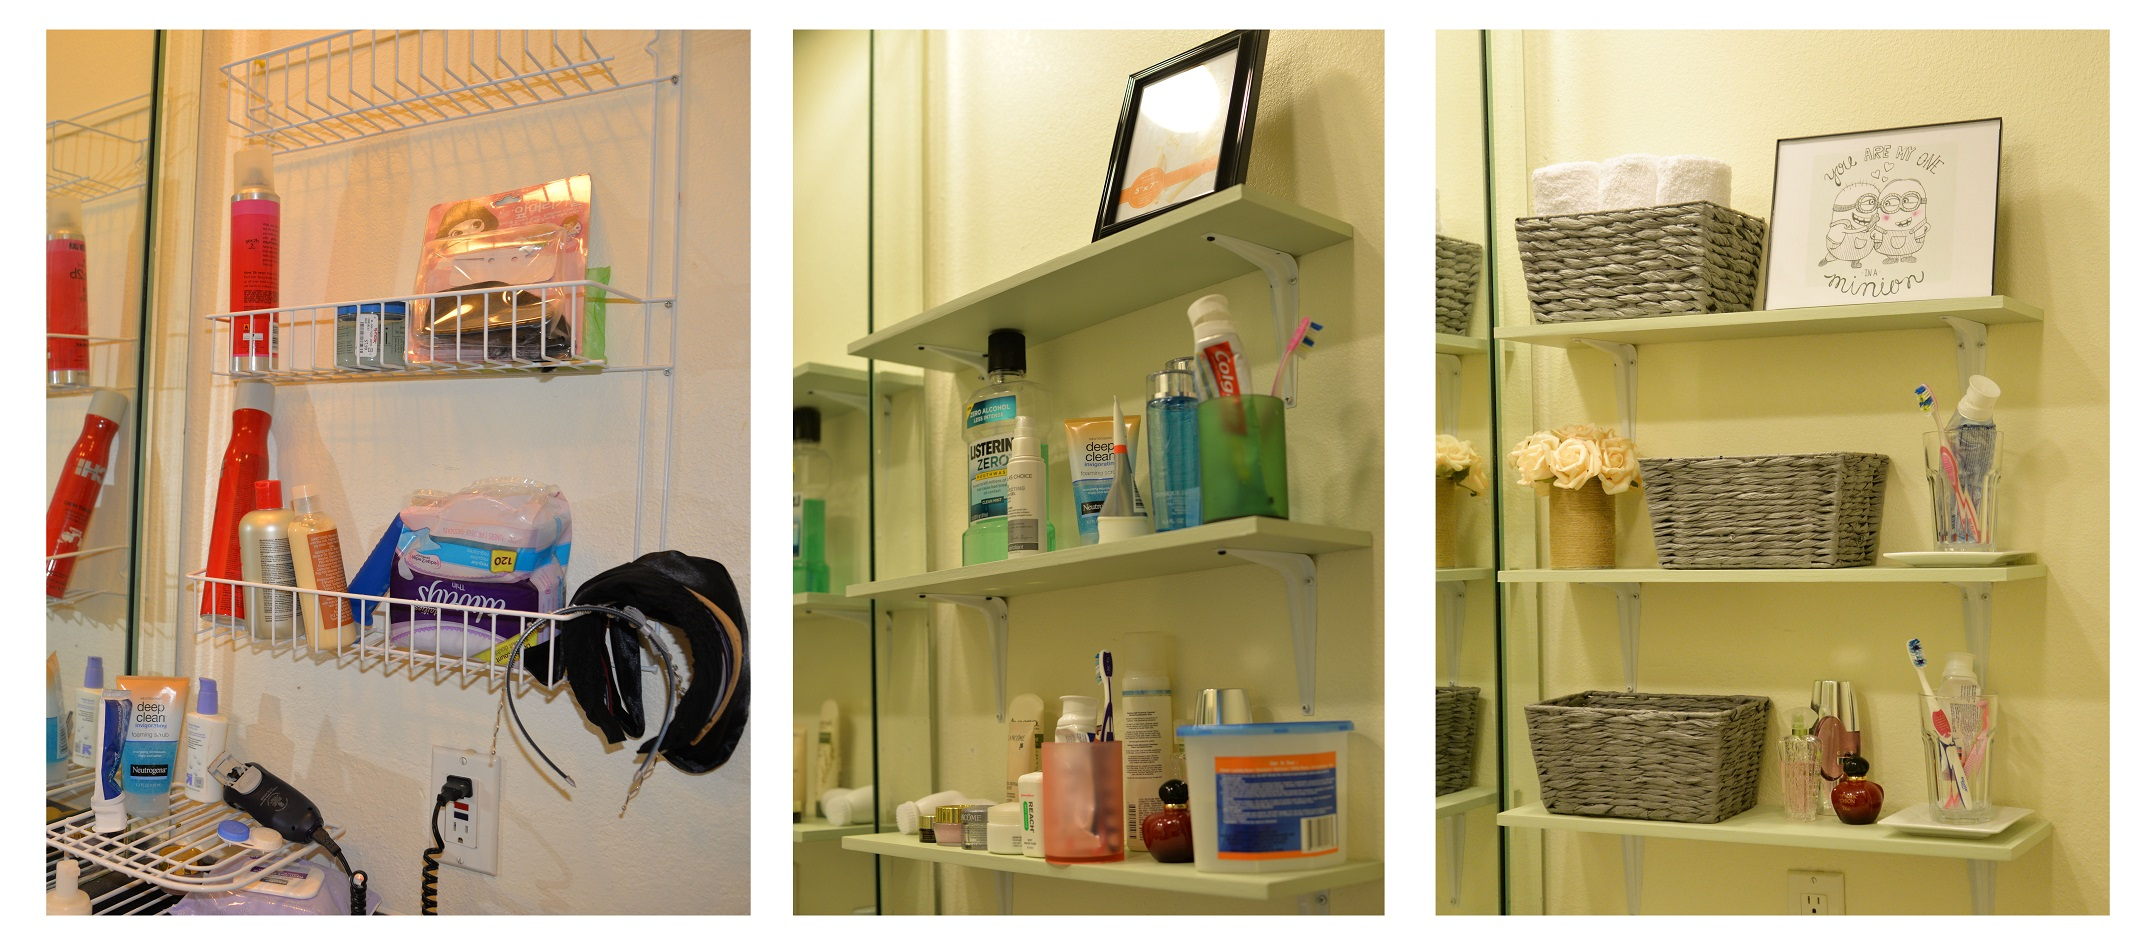 Tidy up my bathroom vanity with DIY shelves | justannelife